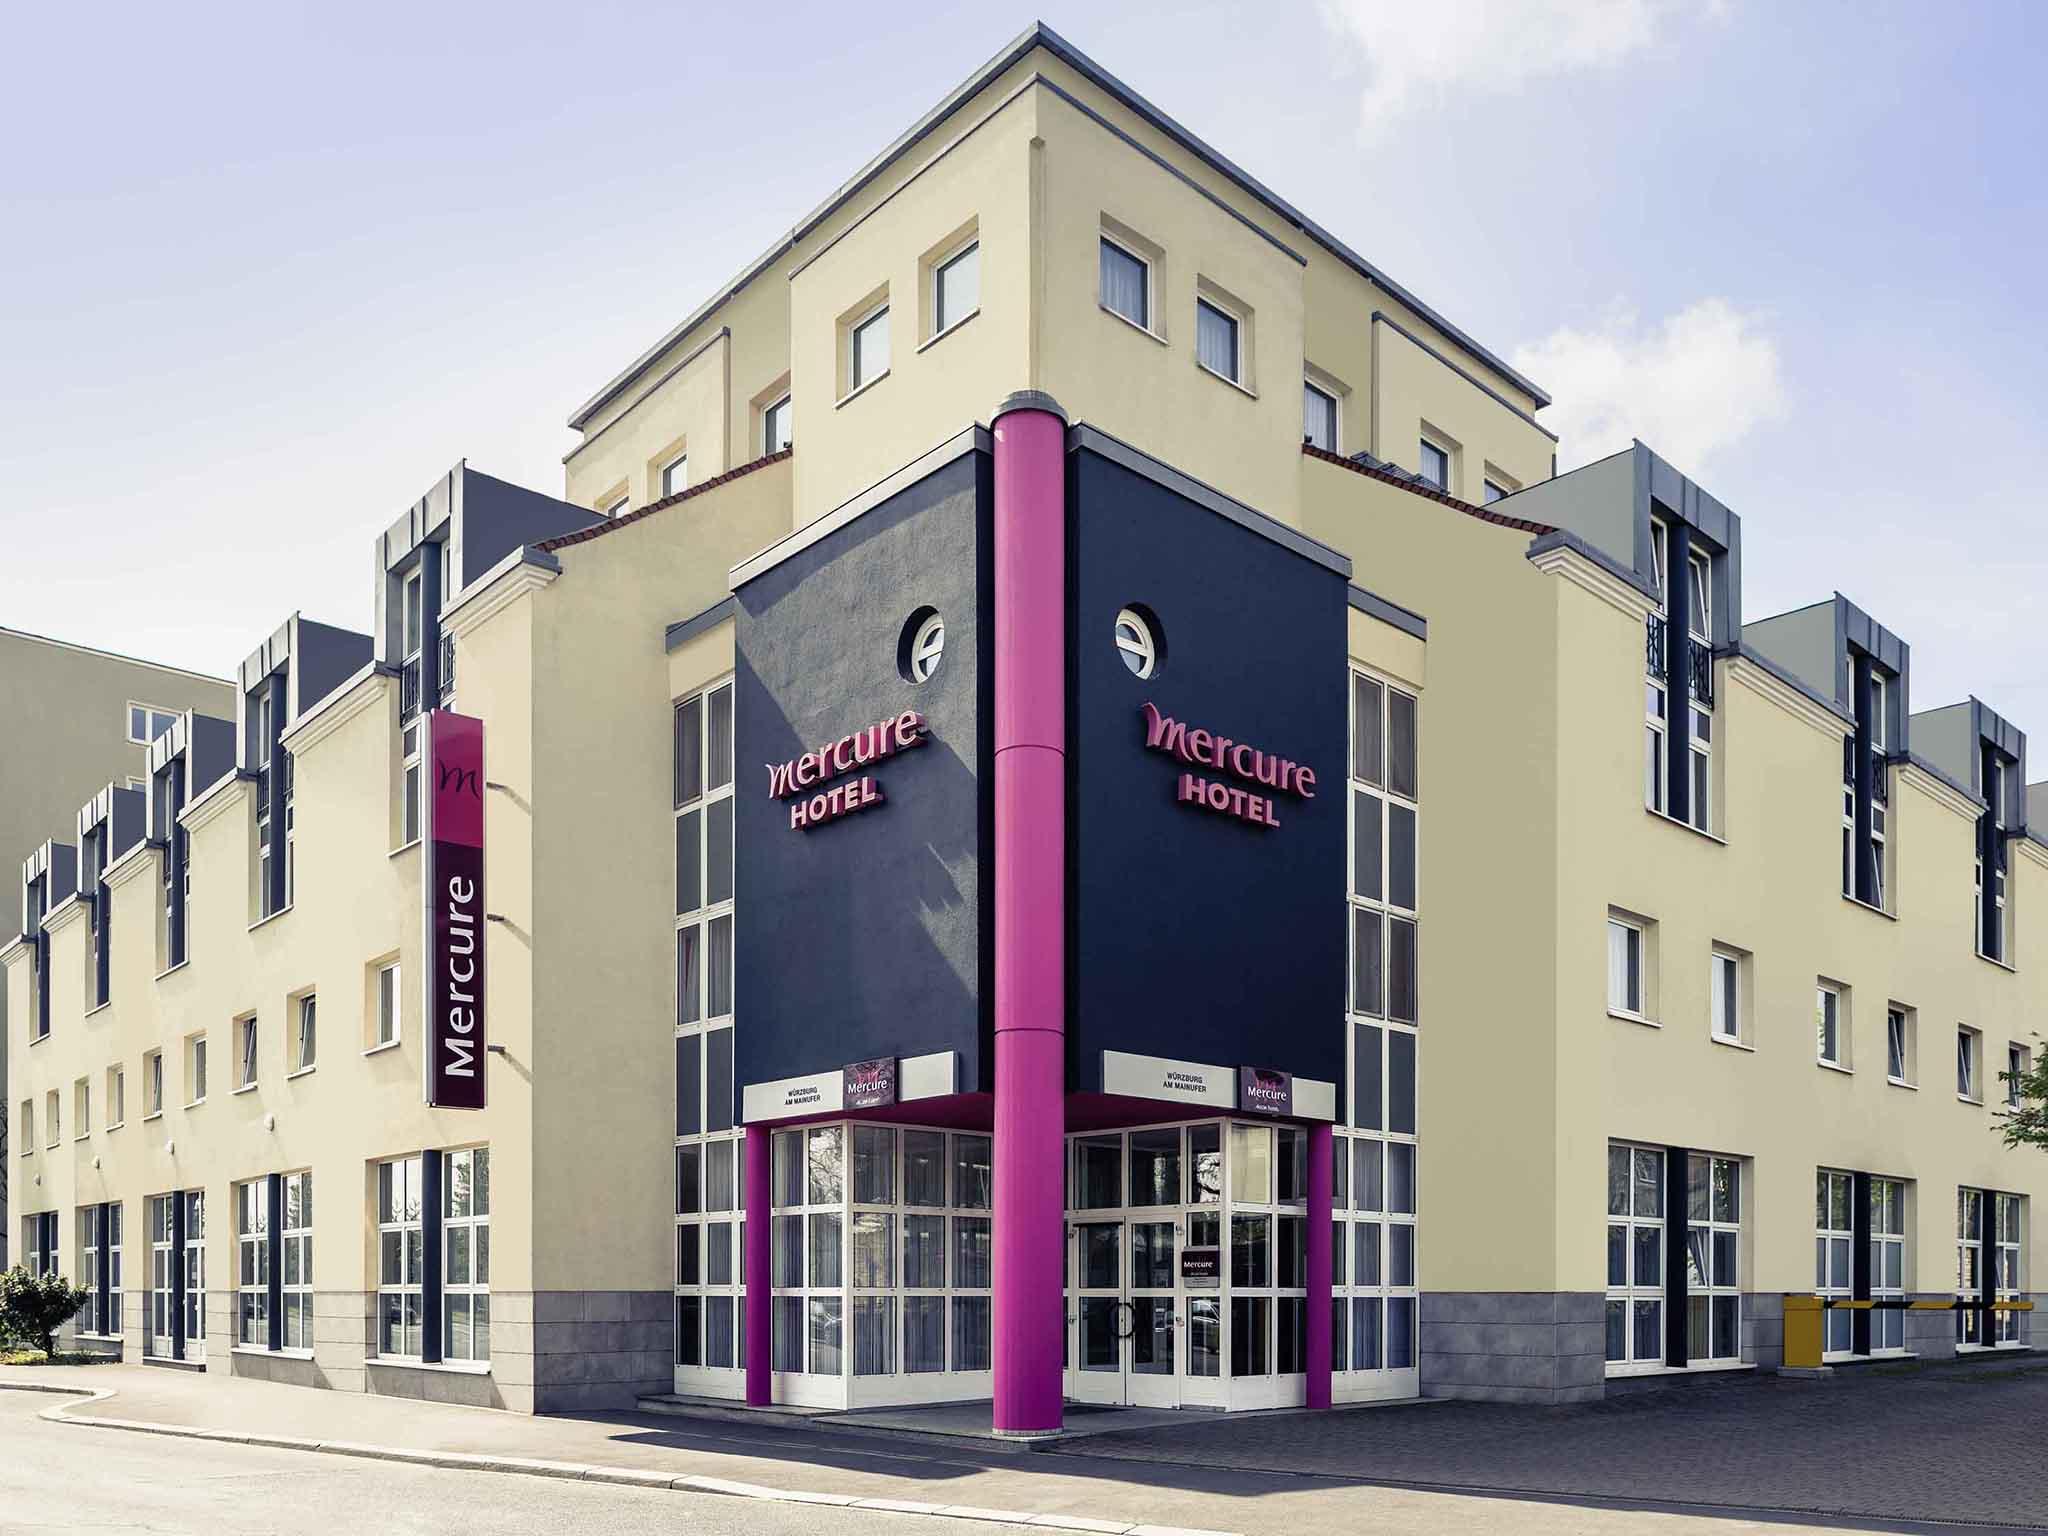 Hôtel - Mercure Hotel Wuerzburg am Mainufer